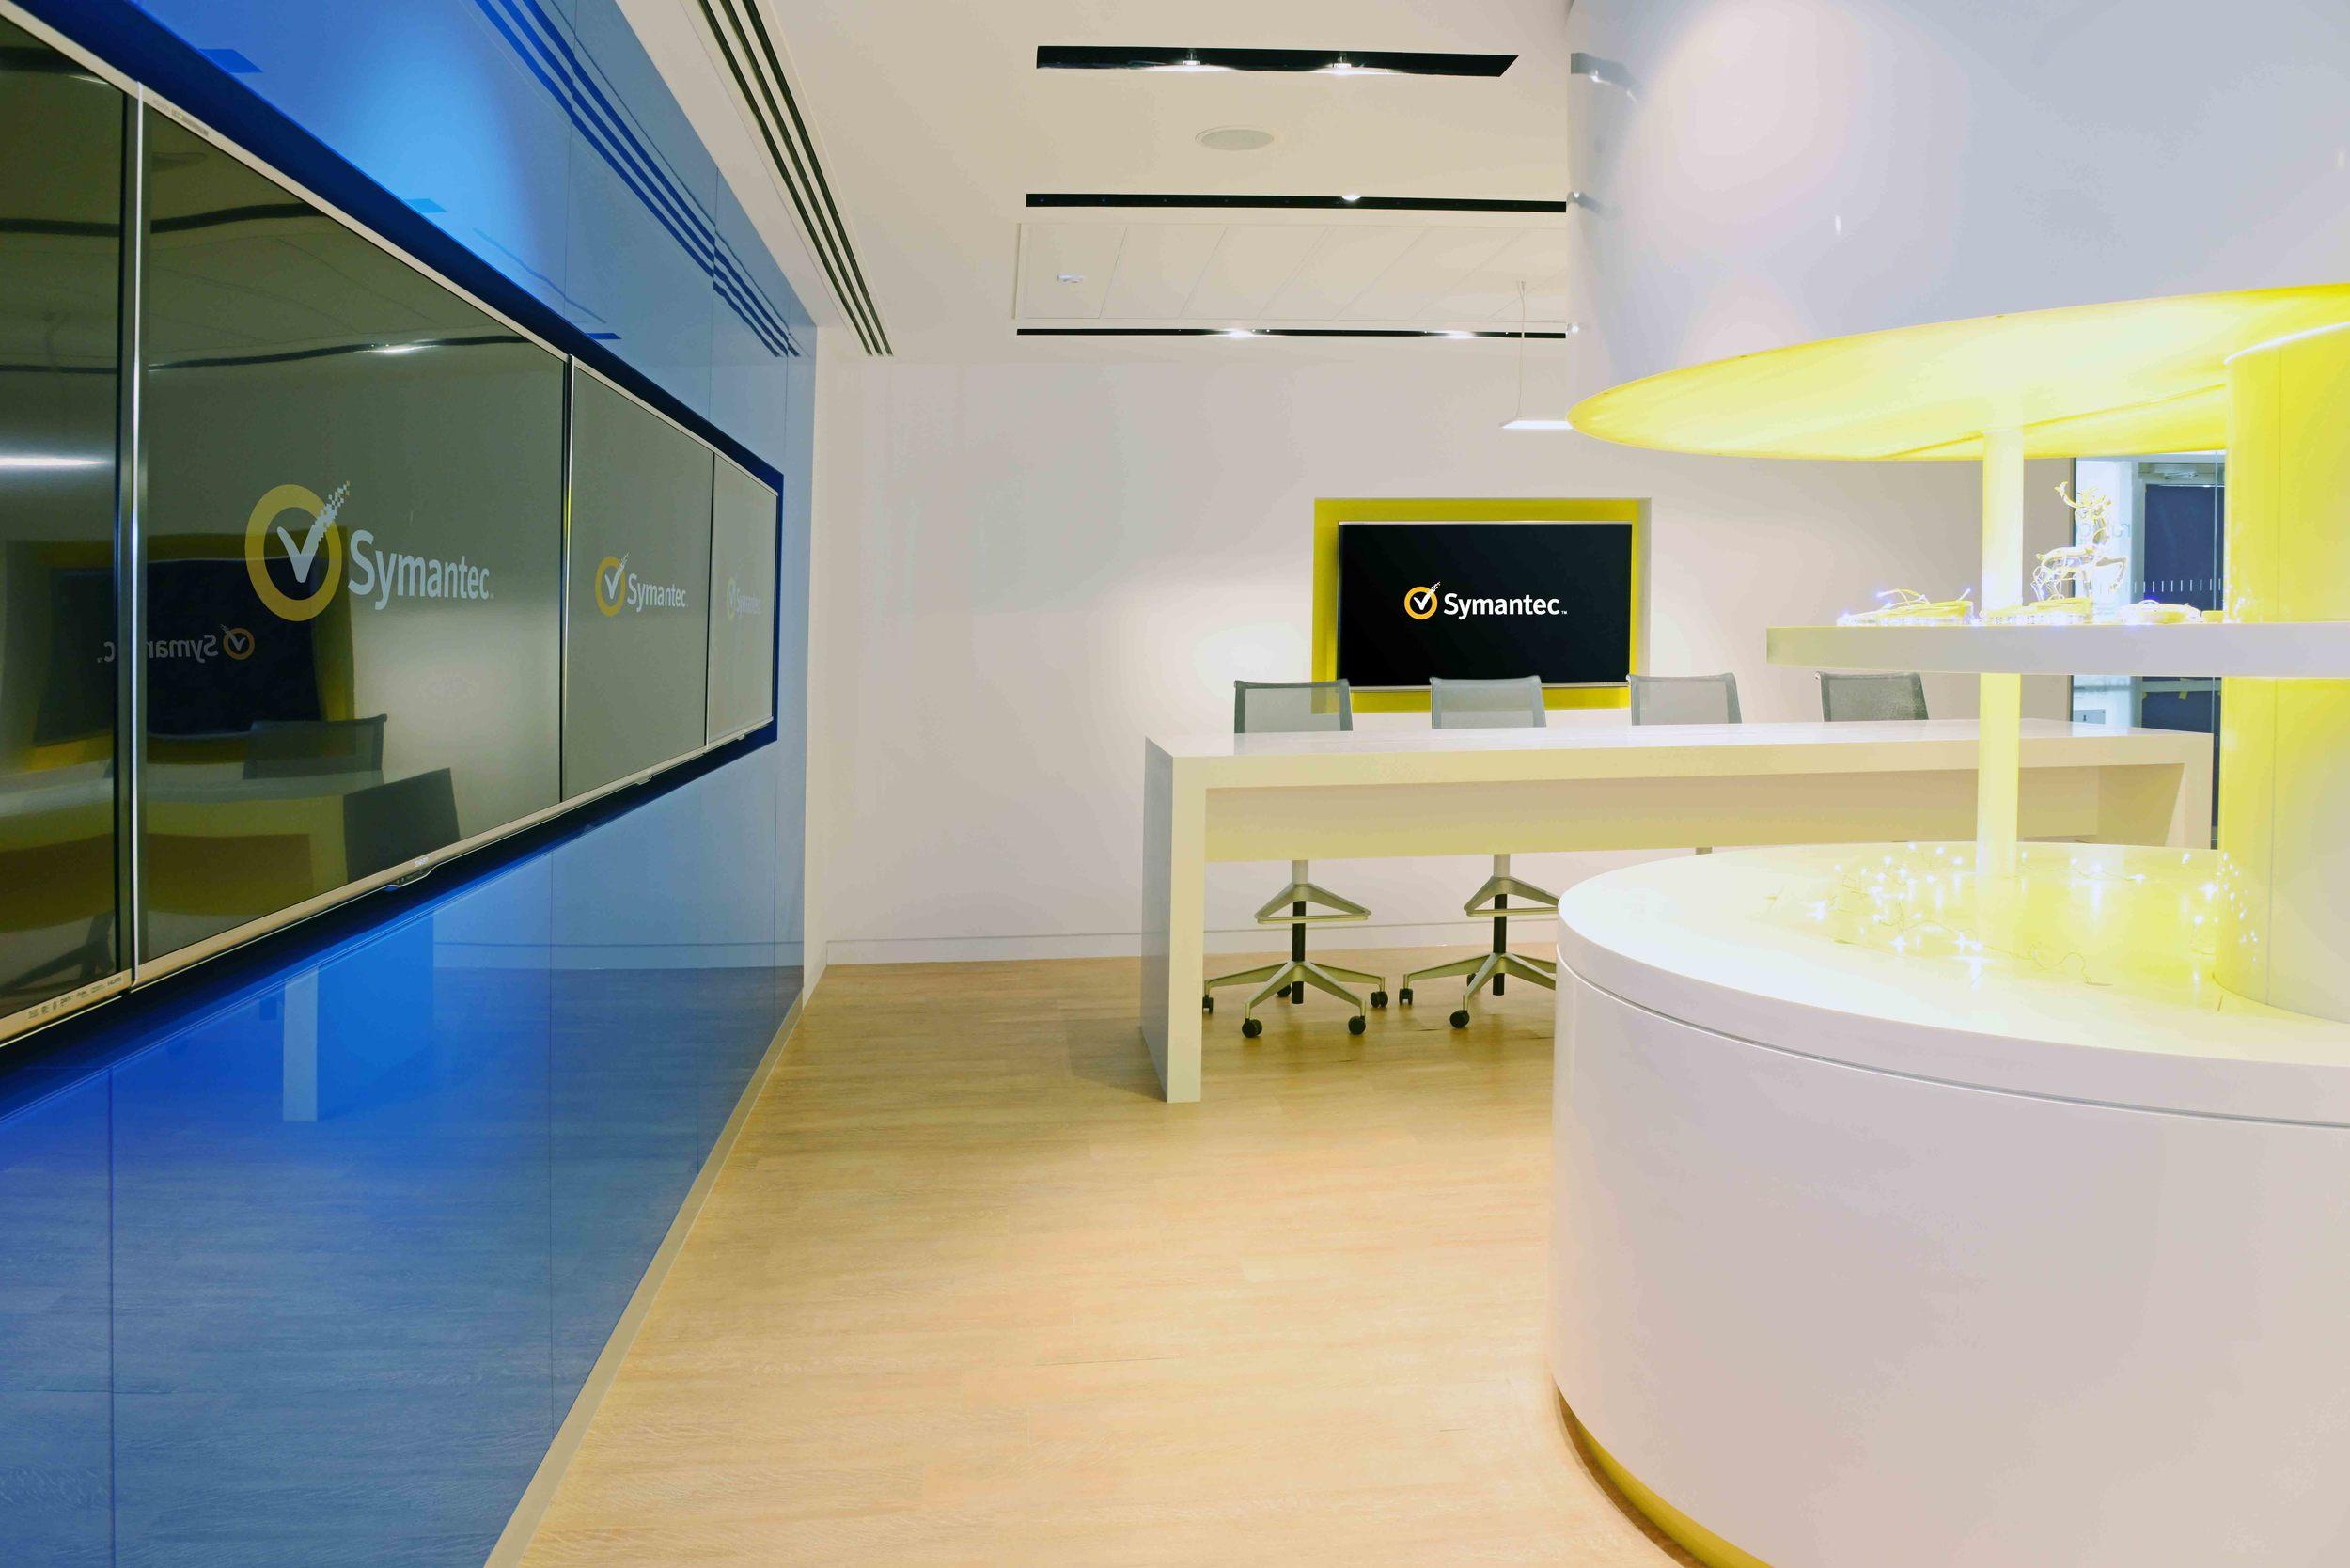 Symantec 5,000 Sq ft – 7 Weeks